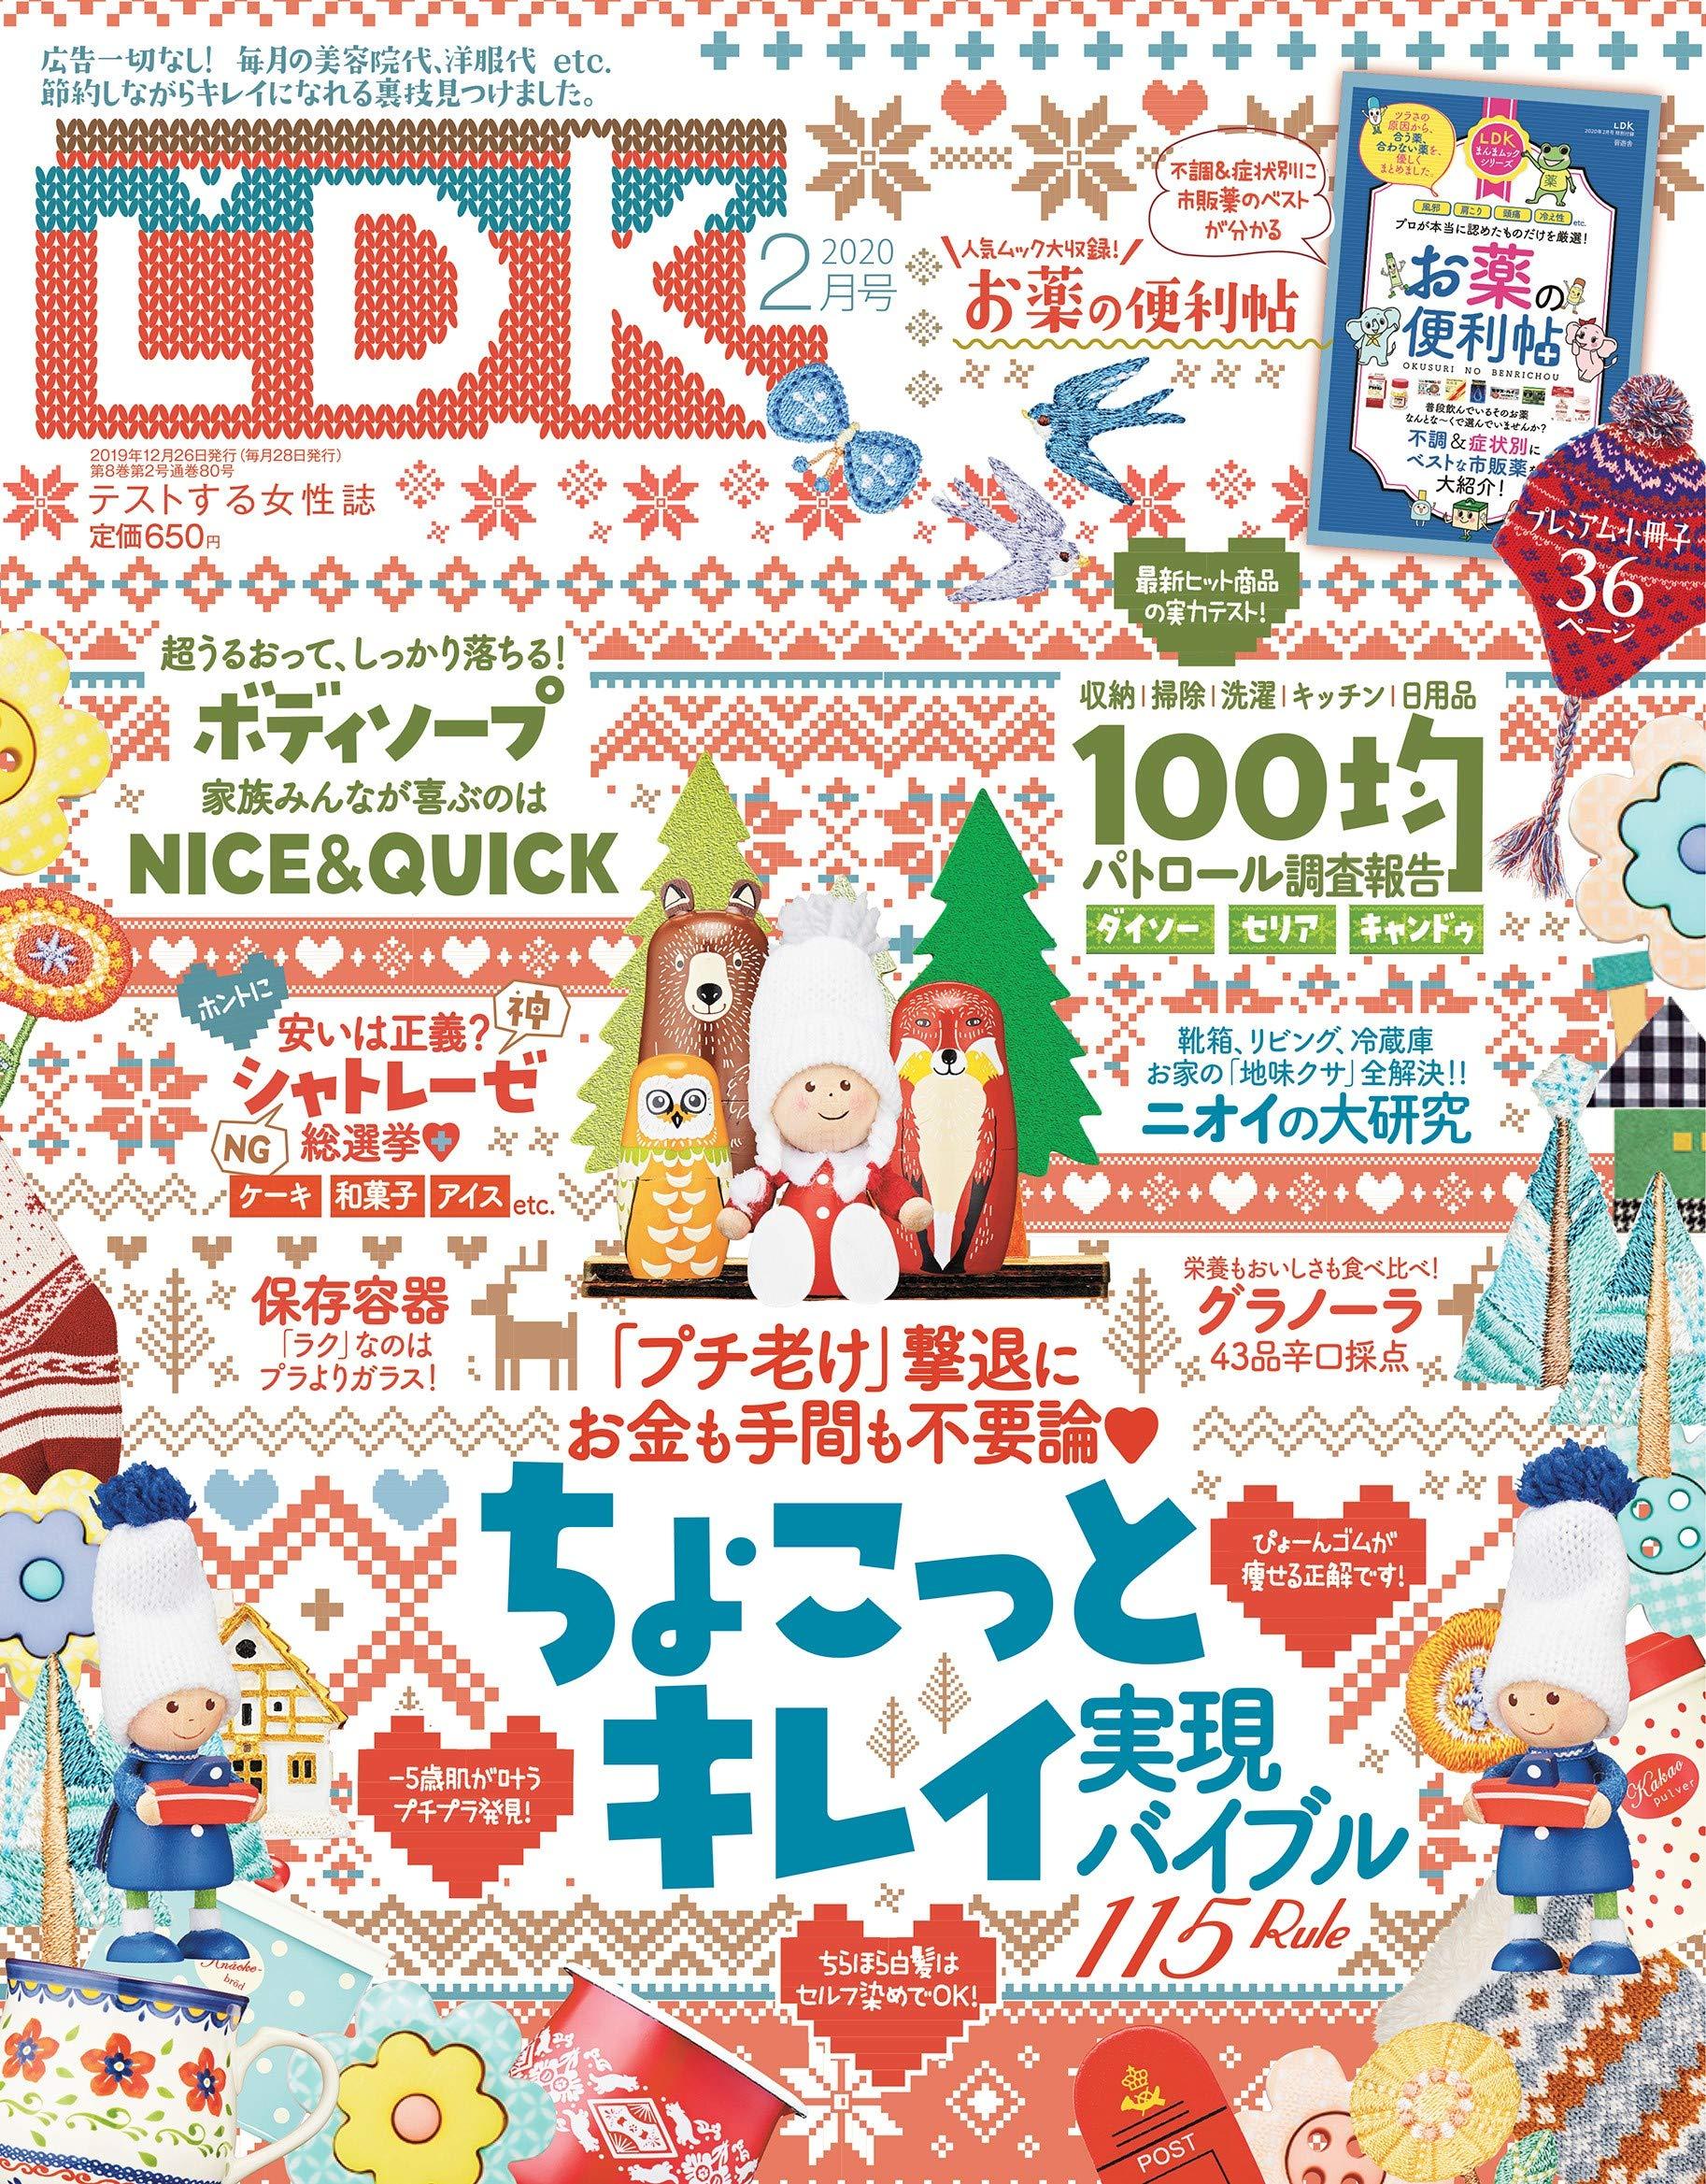 ldk 漫画 最新話 ネタバレ